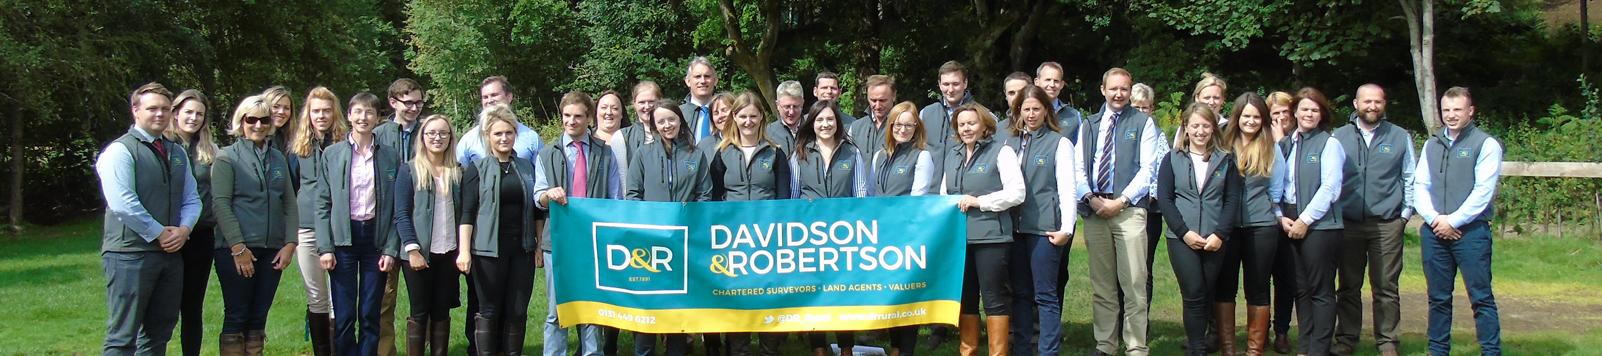 Alison Aitken Davidson Robertson Senior Surveyor And Branch